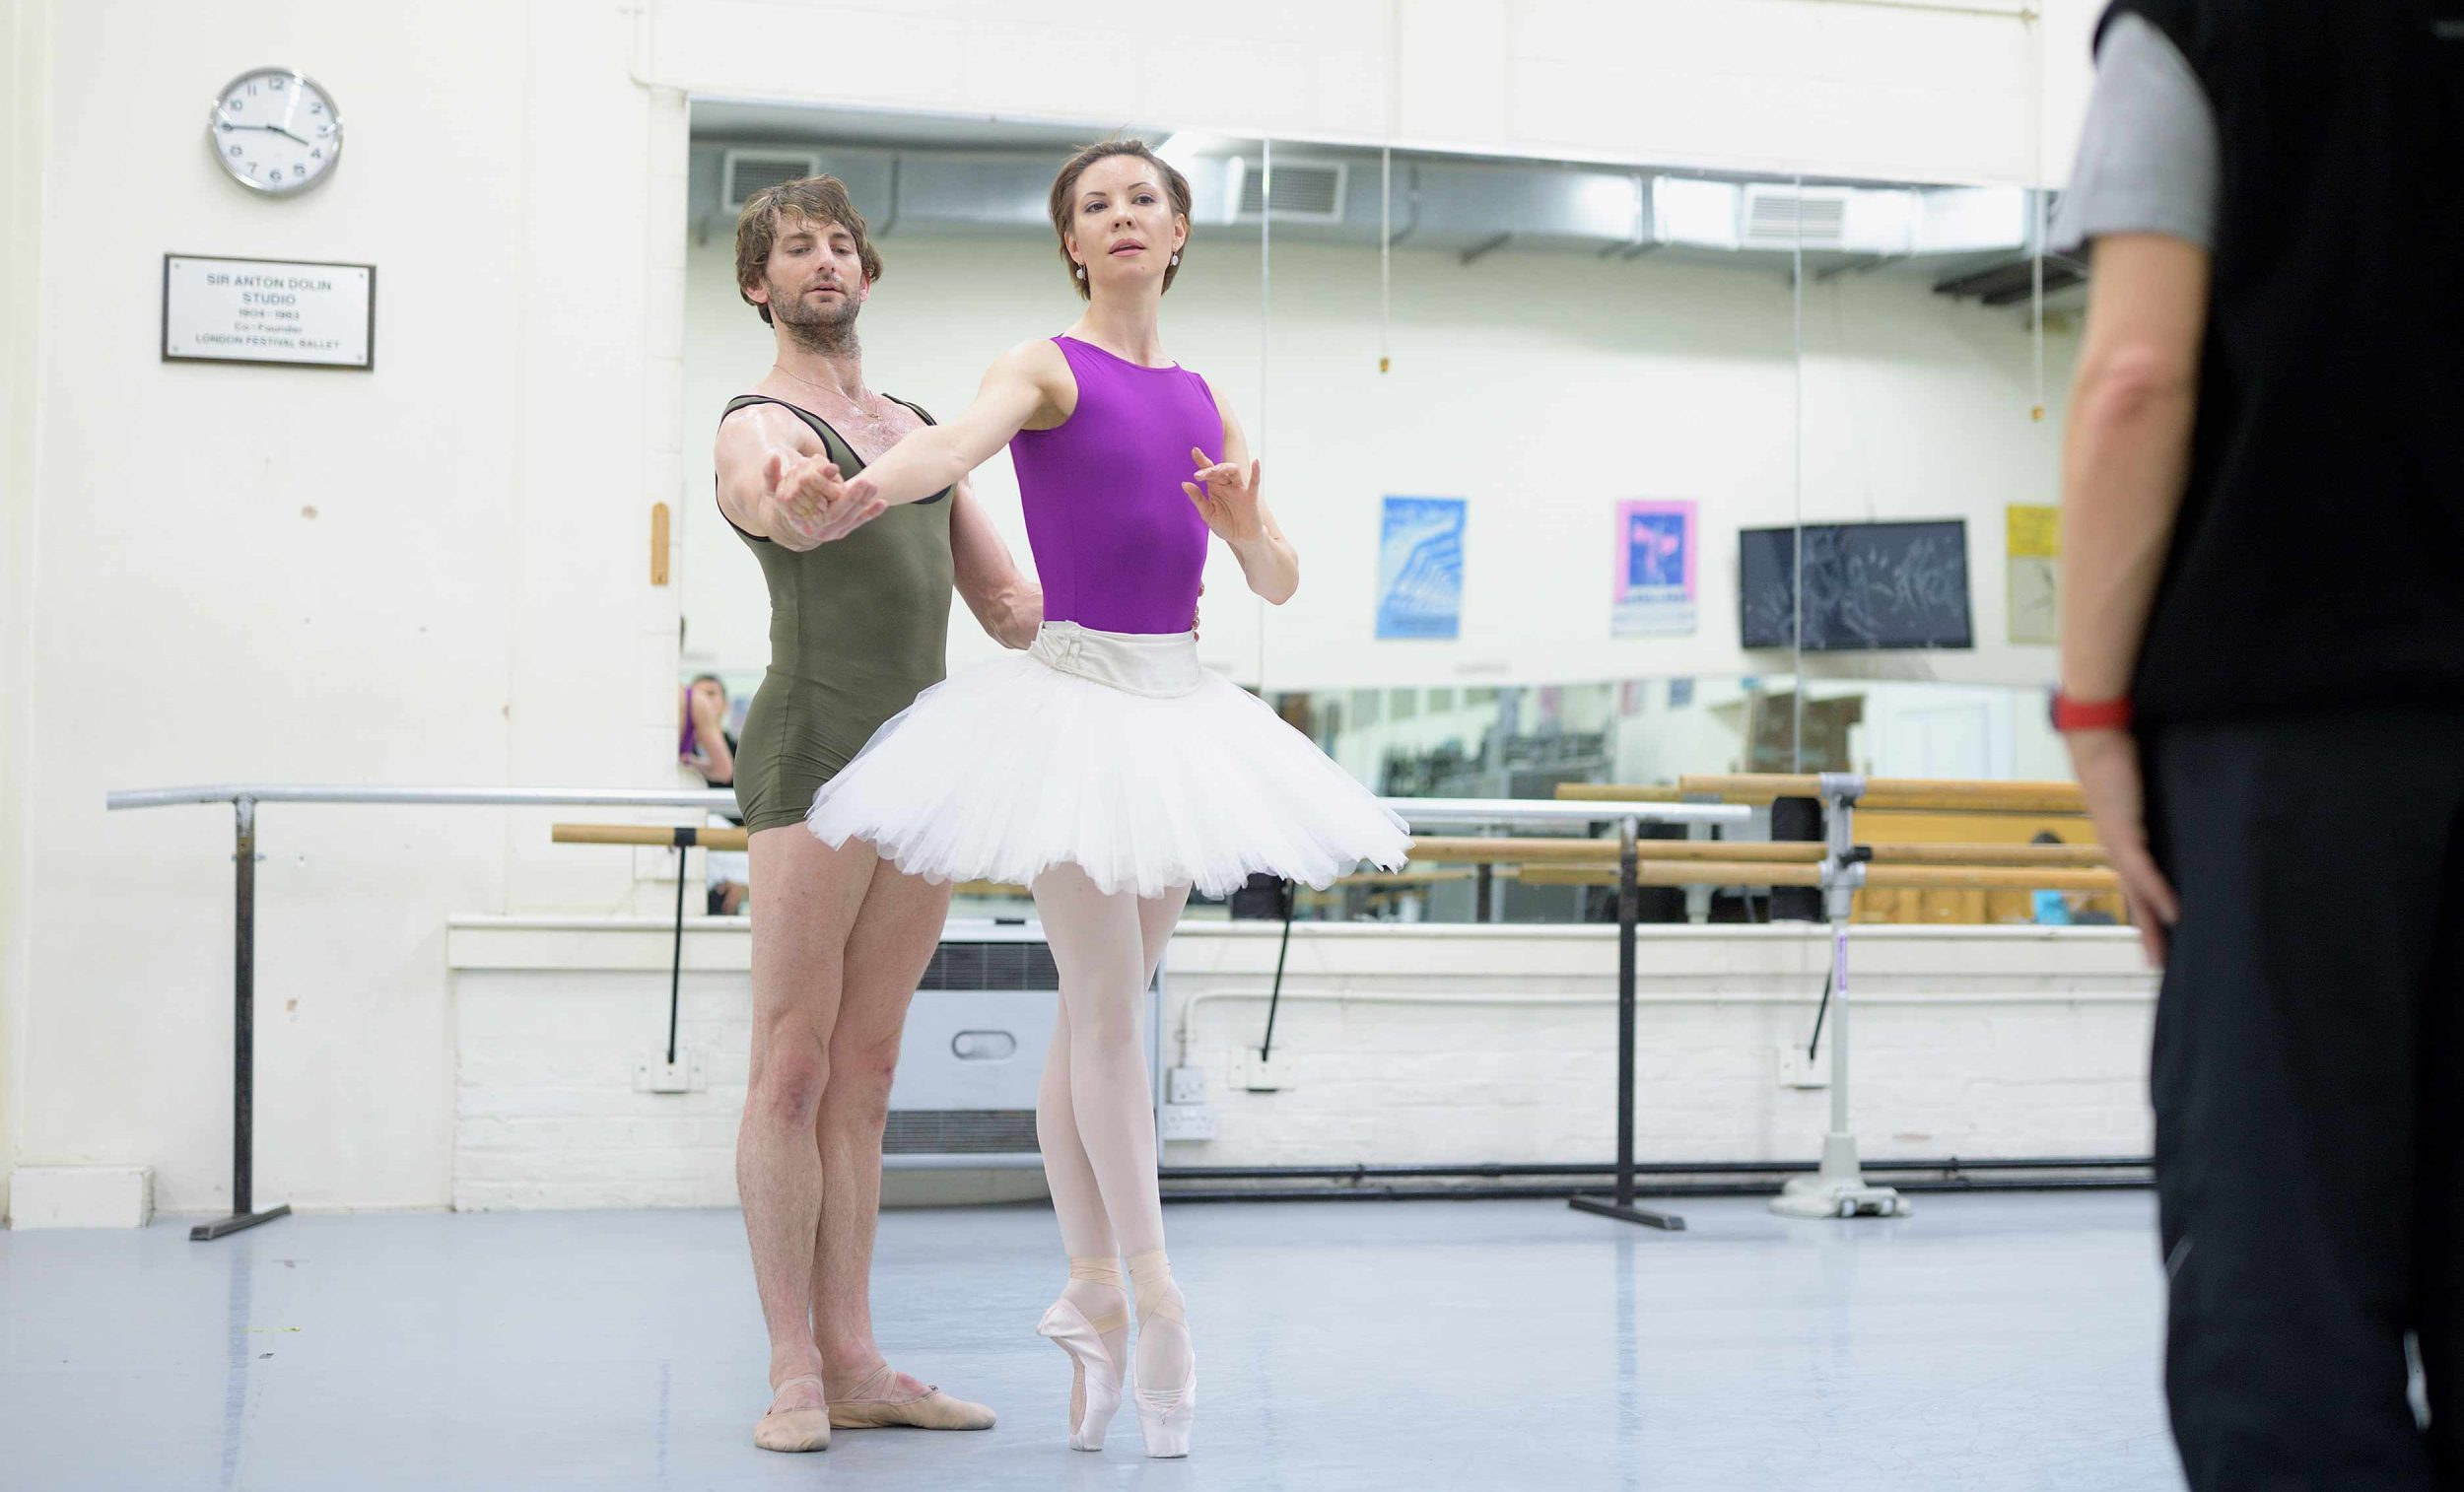 Maria-Alexandrova-and-Aaron-Robison-rehearsing-The-Sleeping-Beauty-©-Laurent-Liotardo-(1)